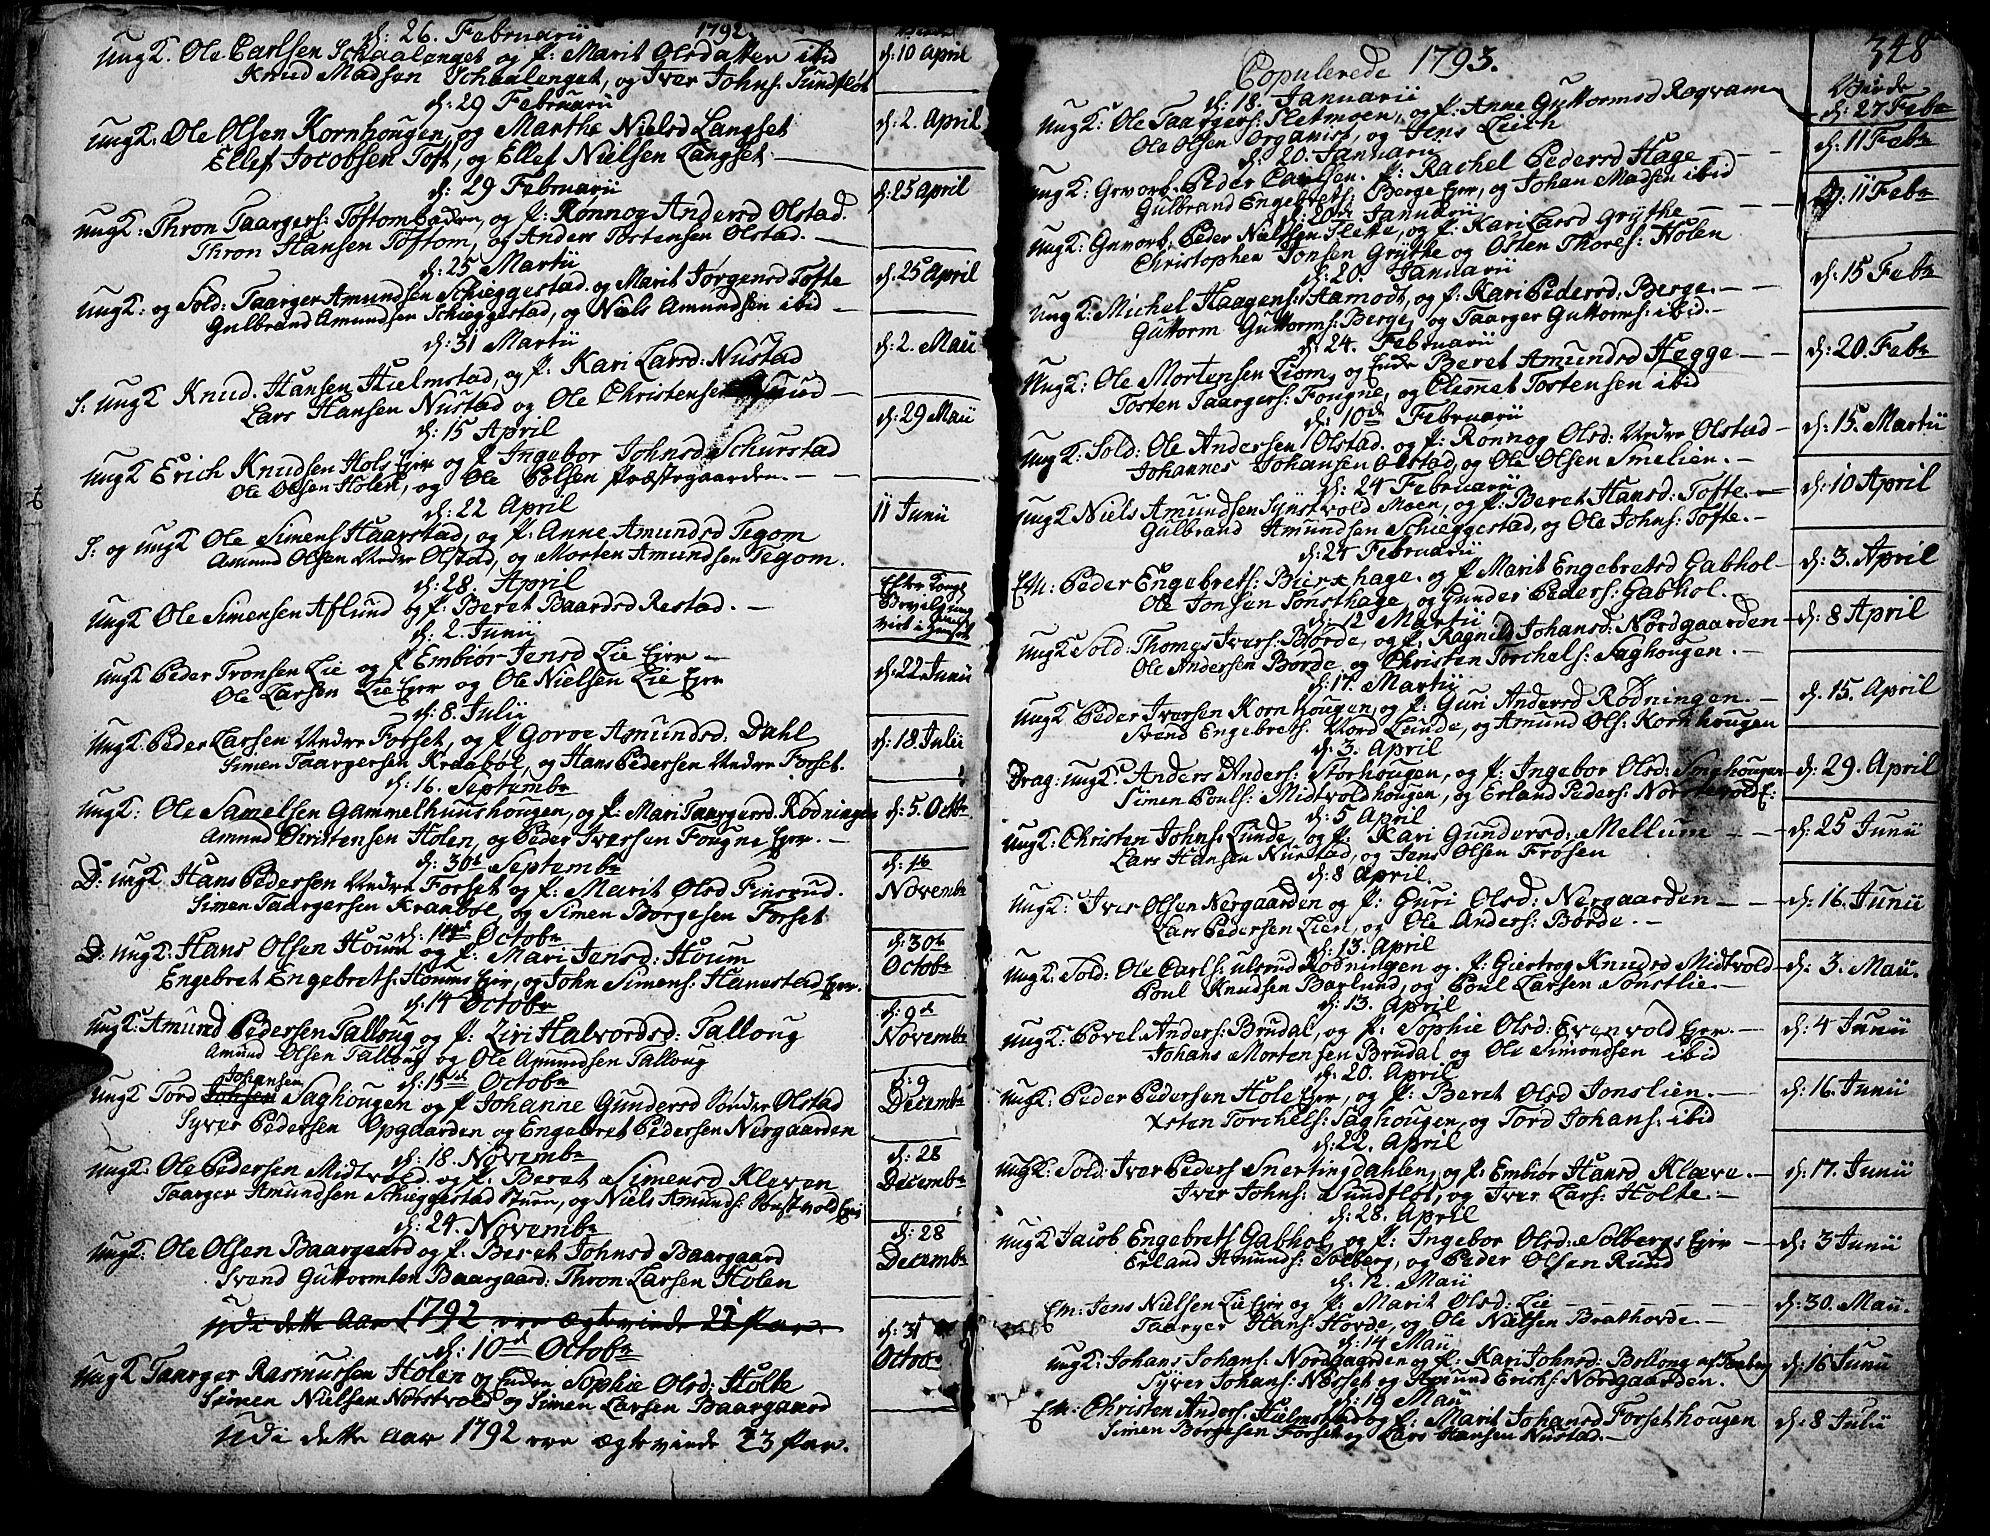 SAH, Gausdal prestekontor, Ministerialbok nr. 3, 1758-1809, s. 348